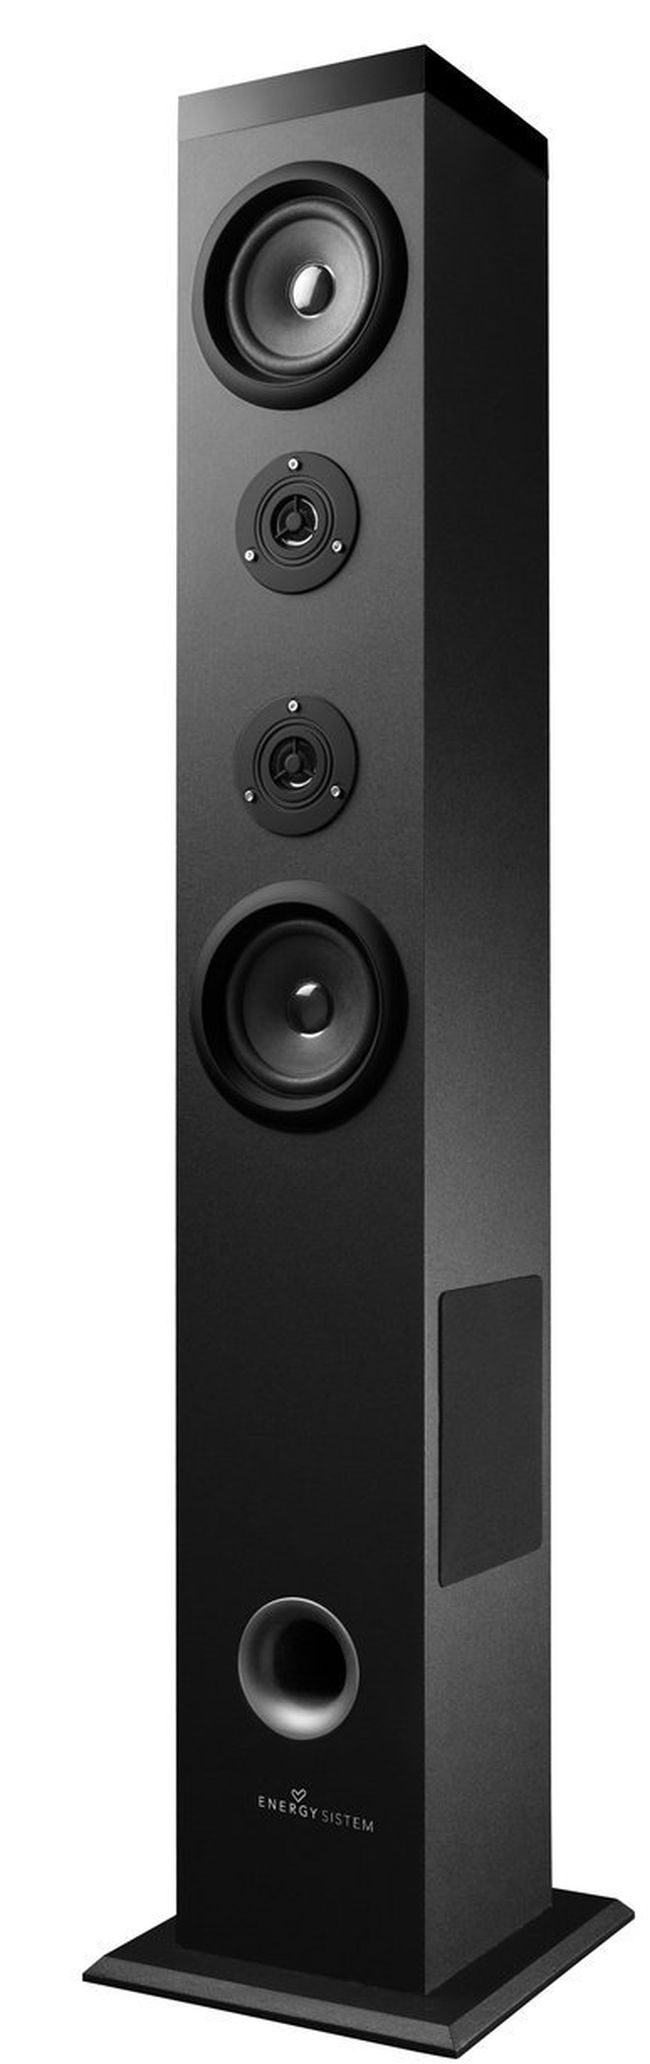 Колонка Energy Sistem Tower 5 - Bluetooth, черна - 1